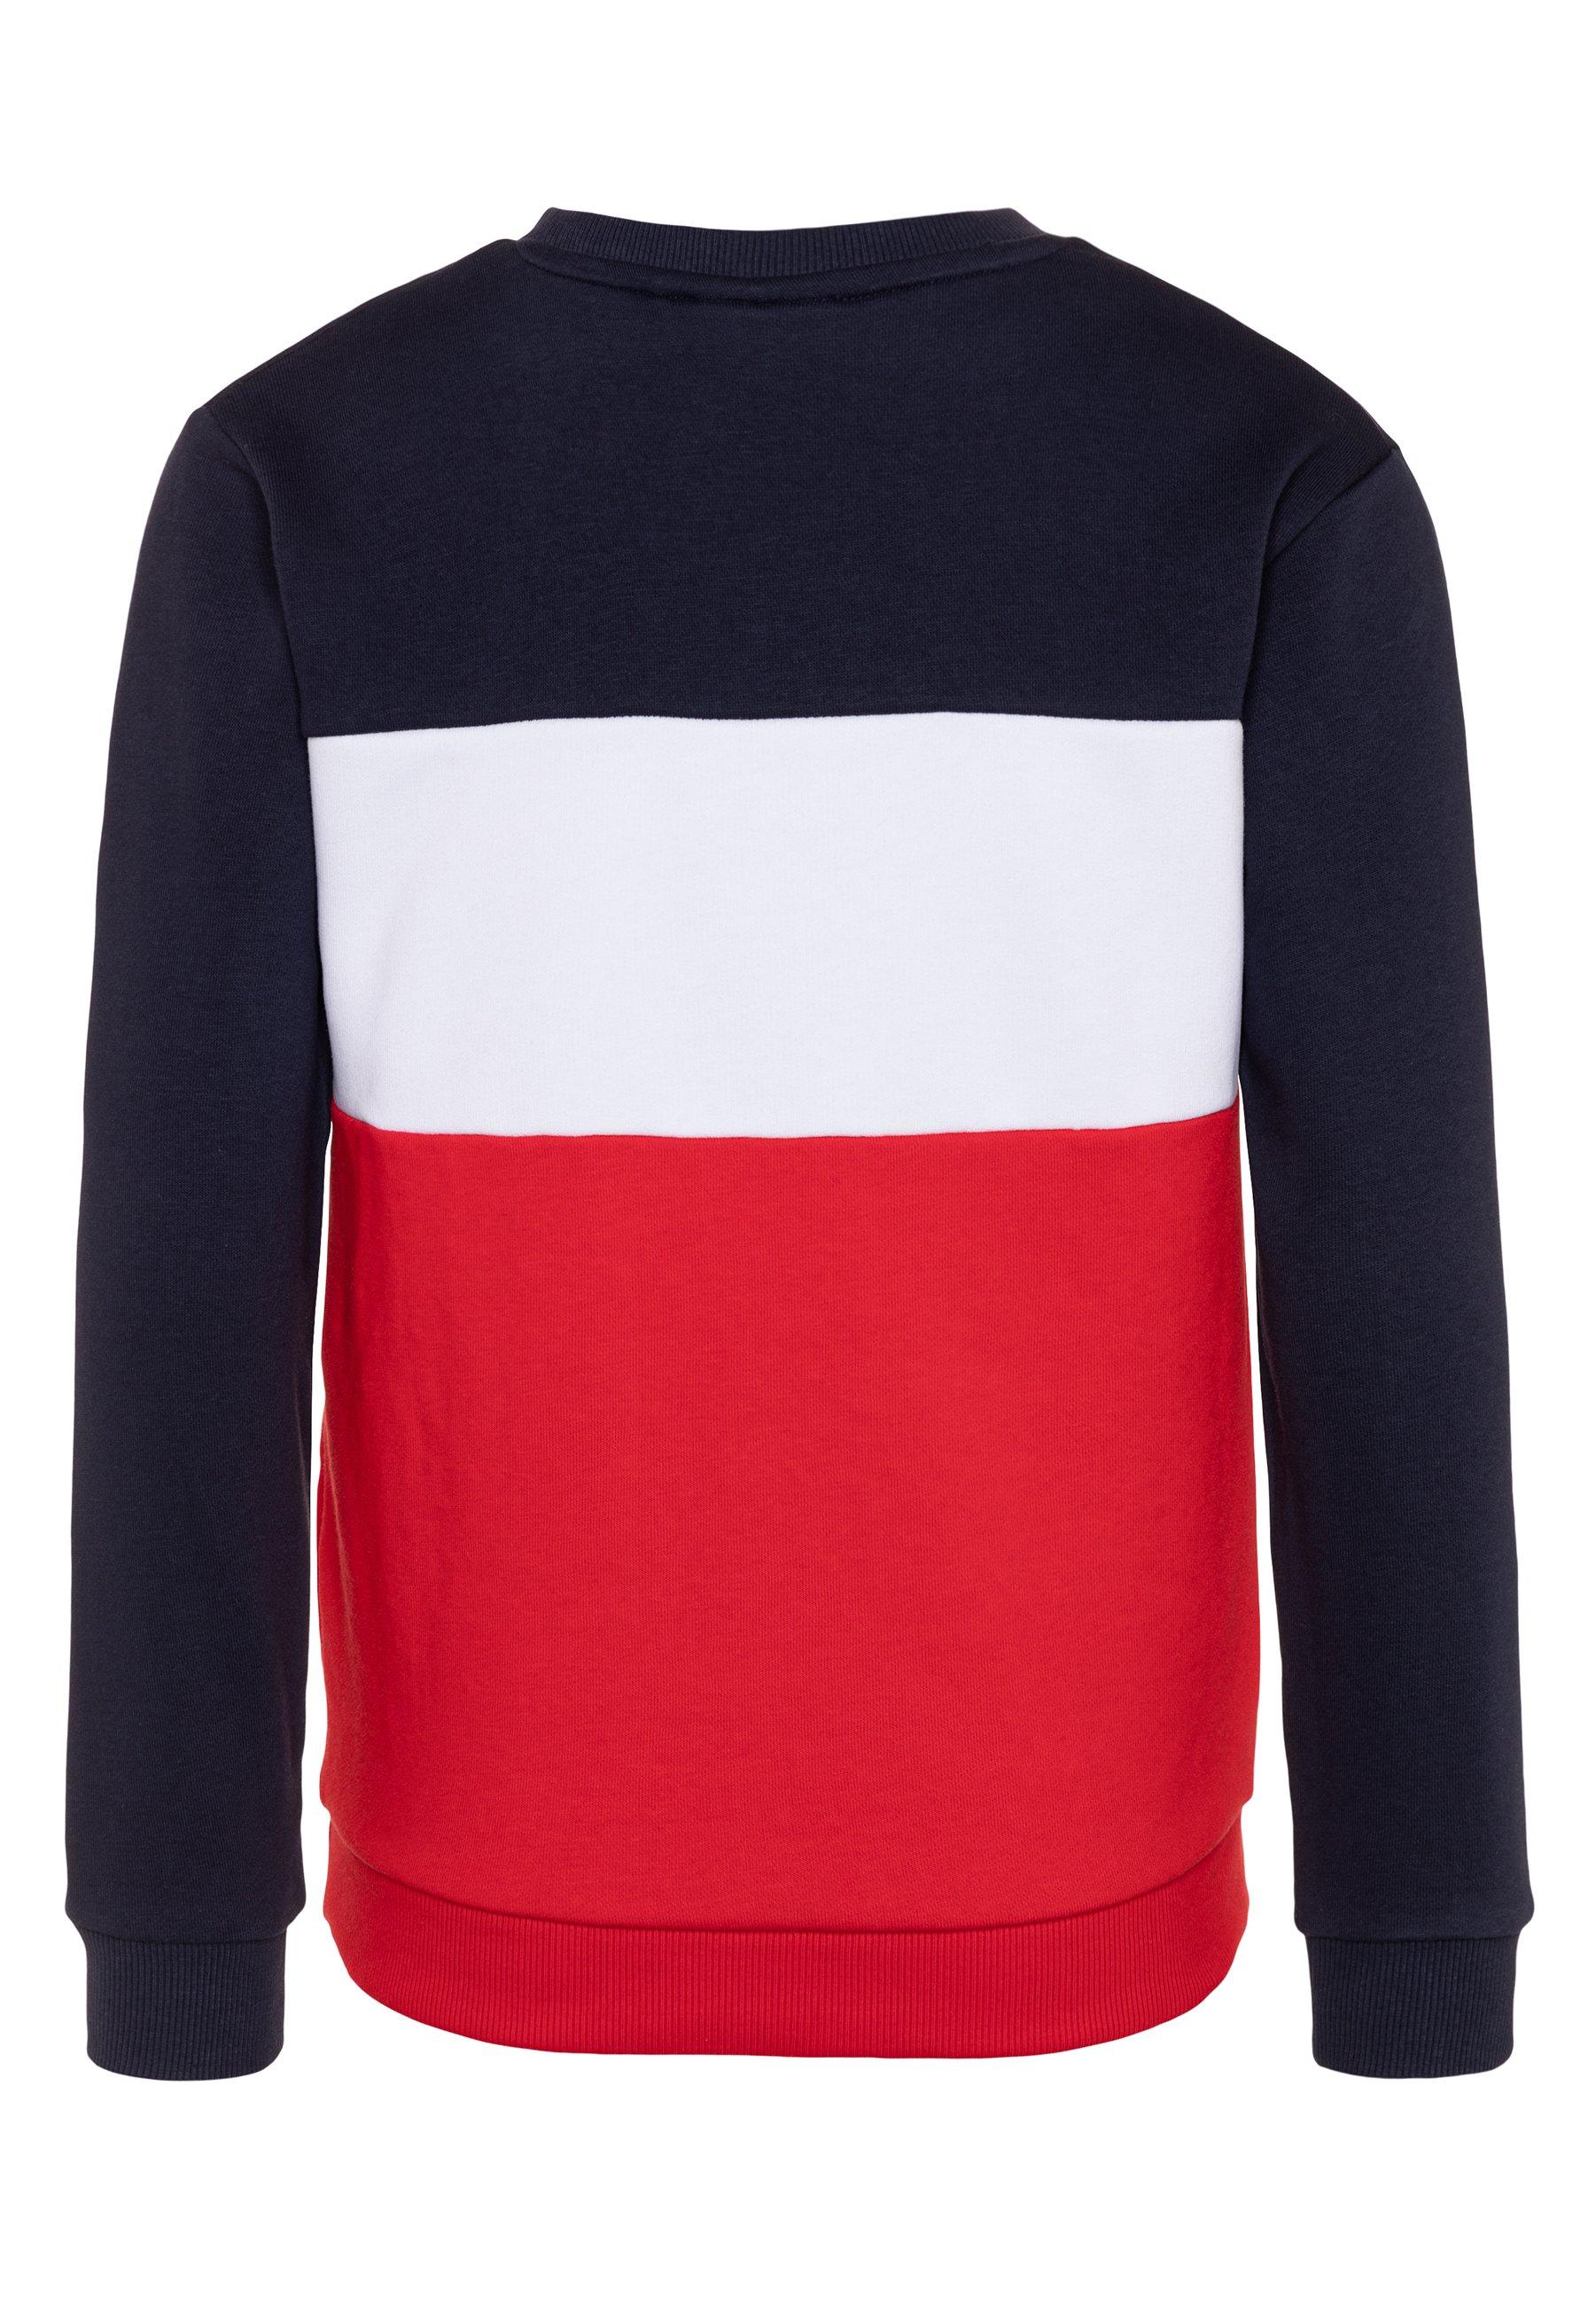 Fila TULIA Sweatshirt black iristrue redbright white